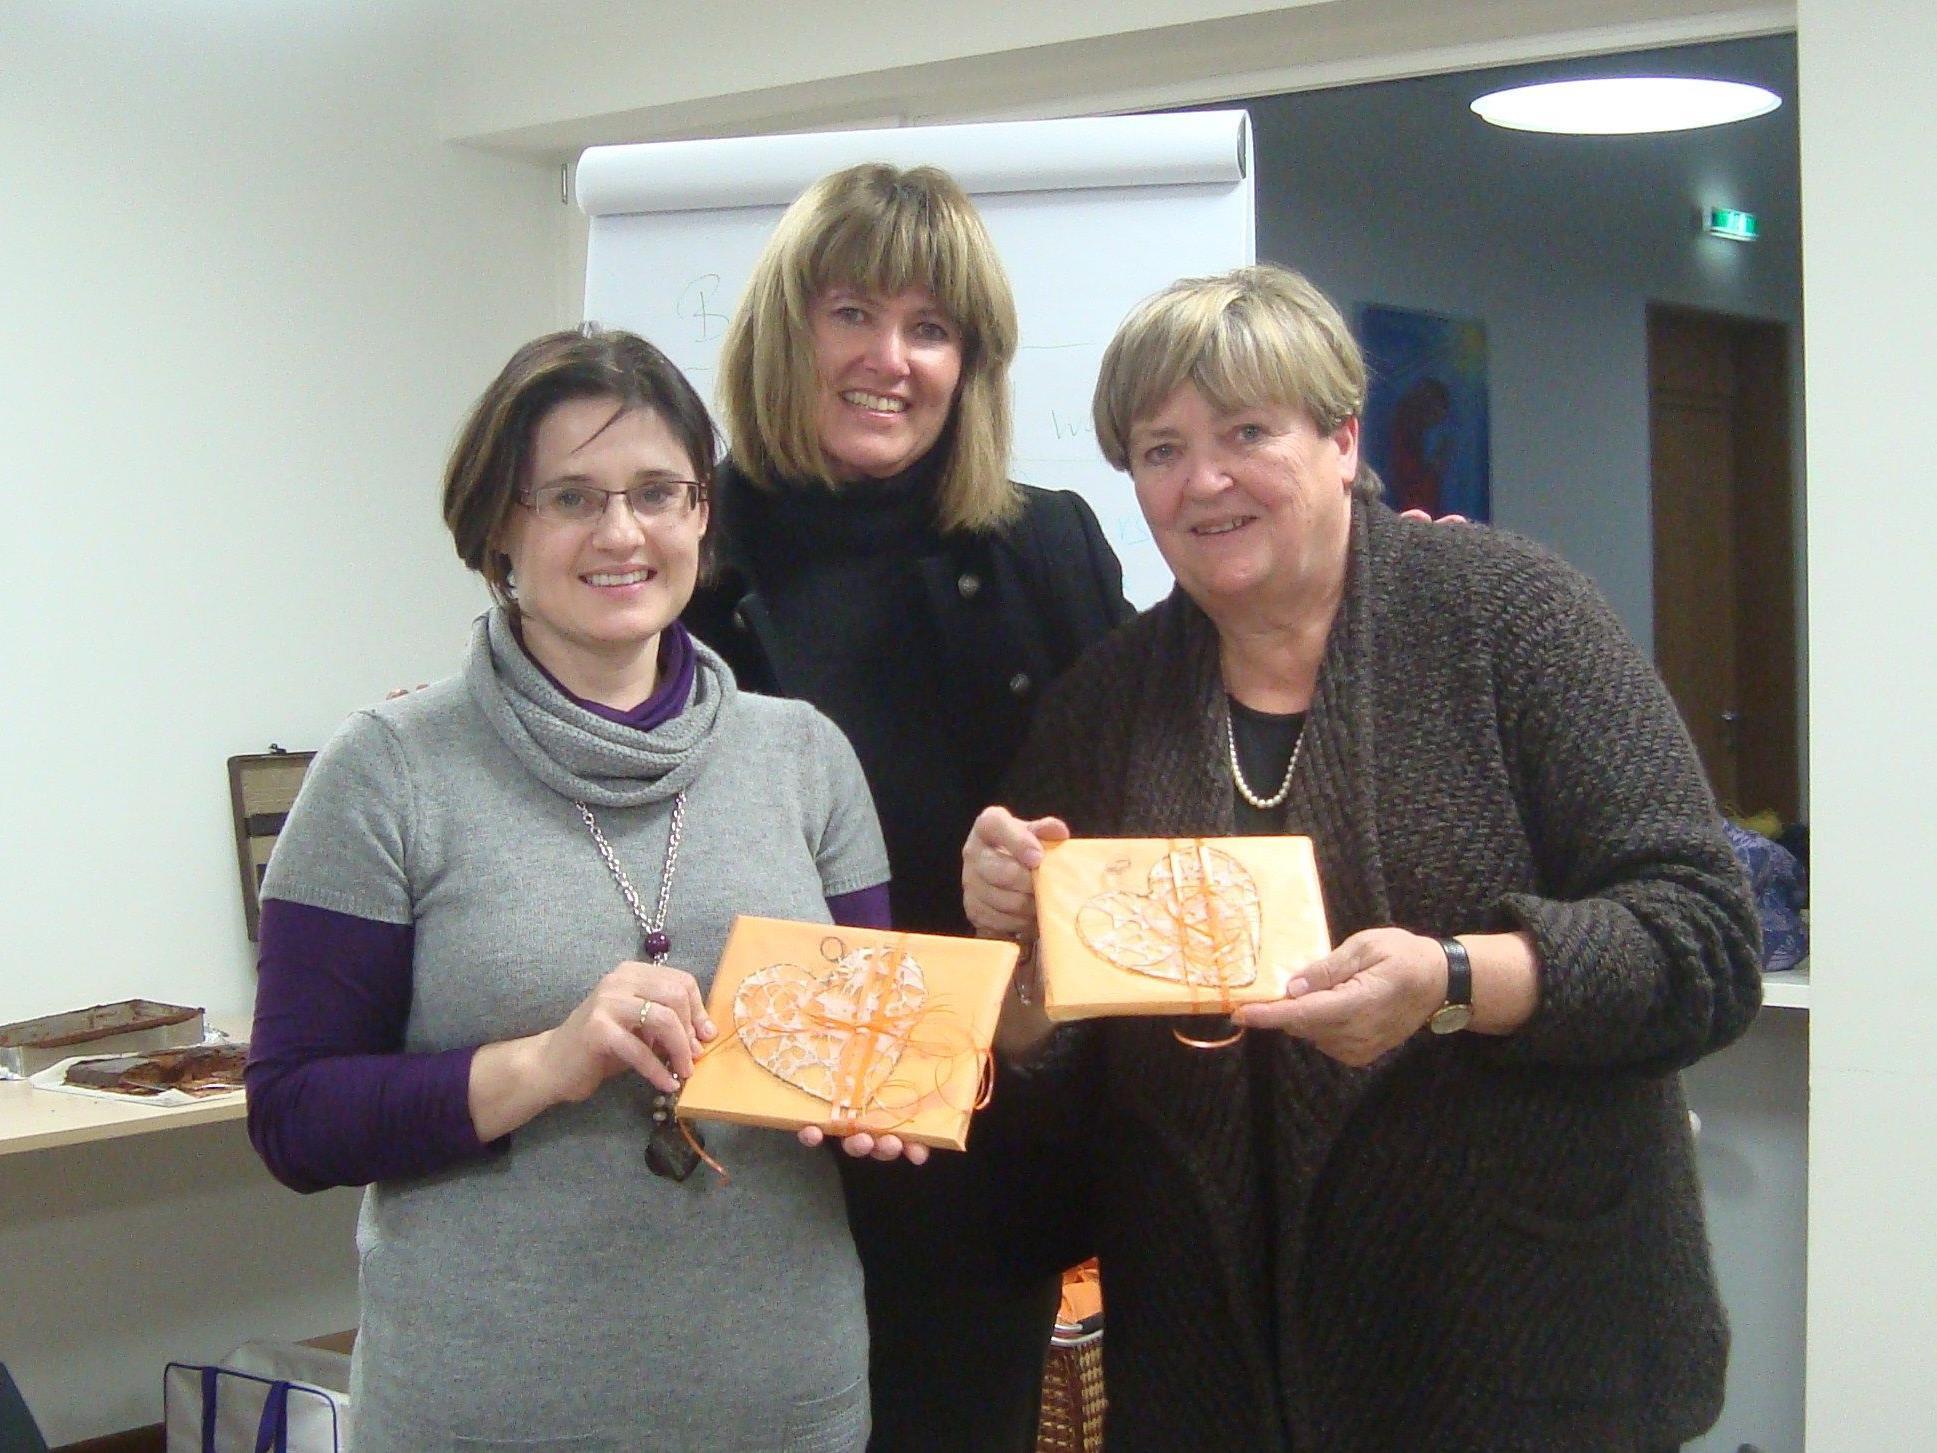 vlnr: Mag. Martina Kronthaler (Generalsekretärin ALÖ), Christina Stoss (Obfrau ALV), Dr. Gertraude Steindl (Präsidentin ALÖ)